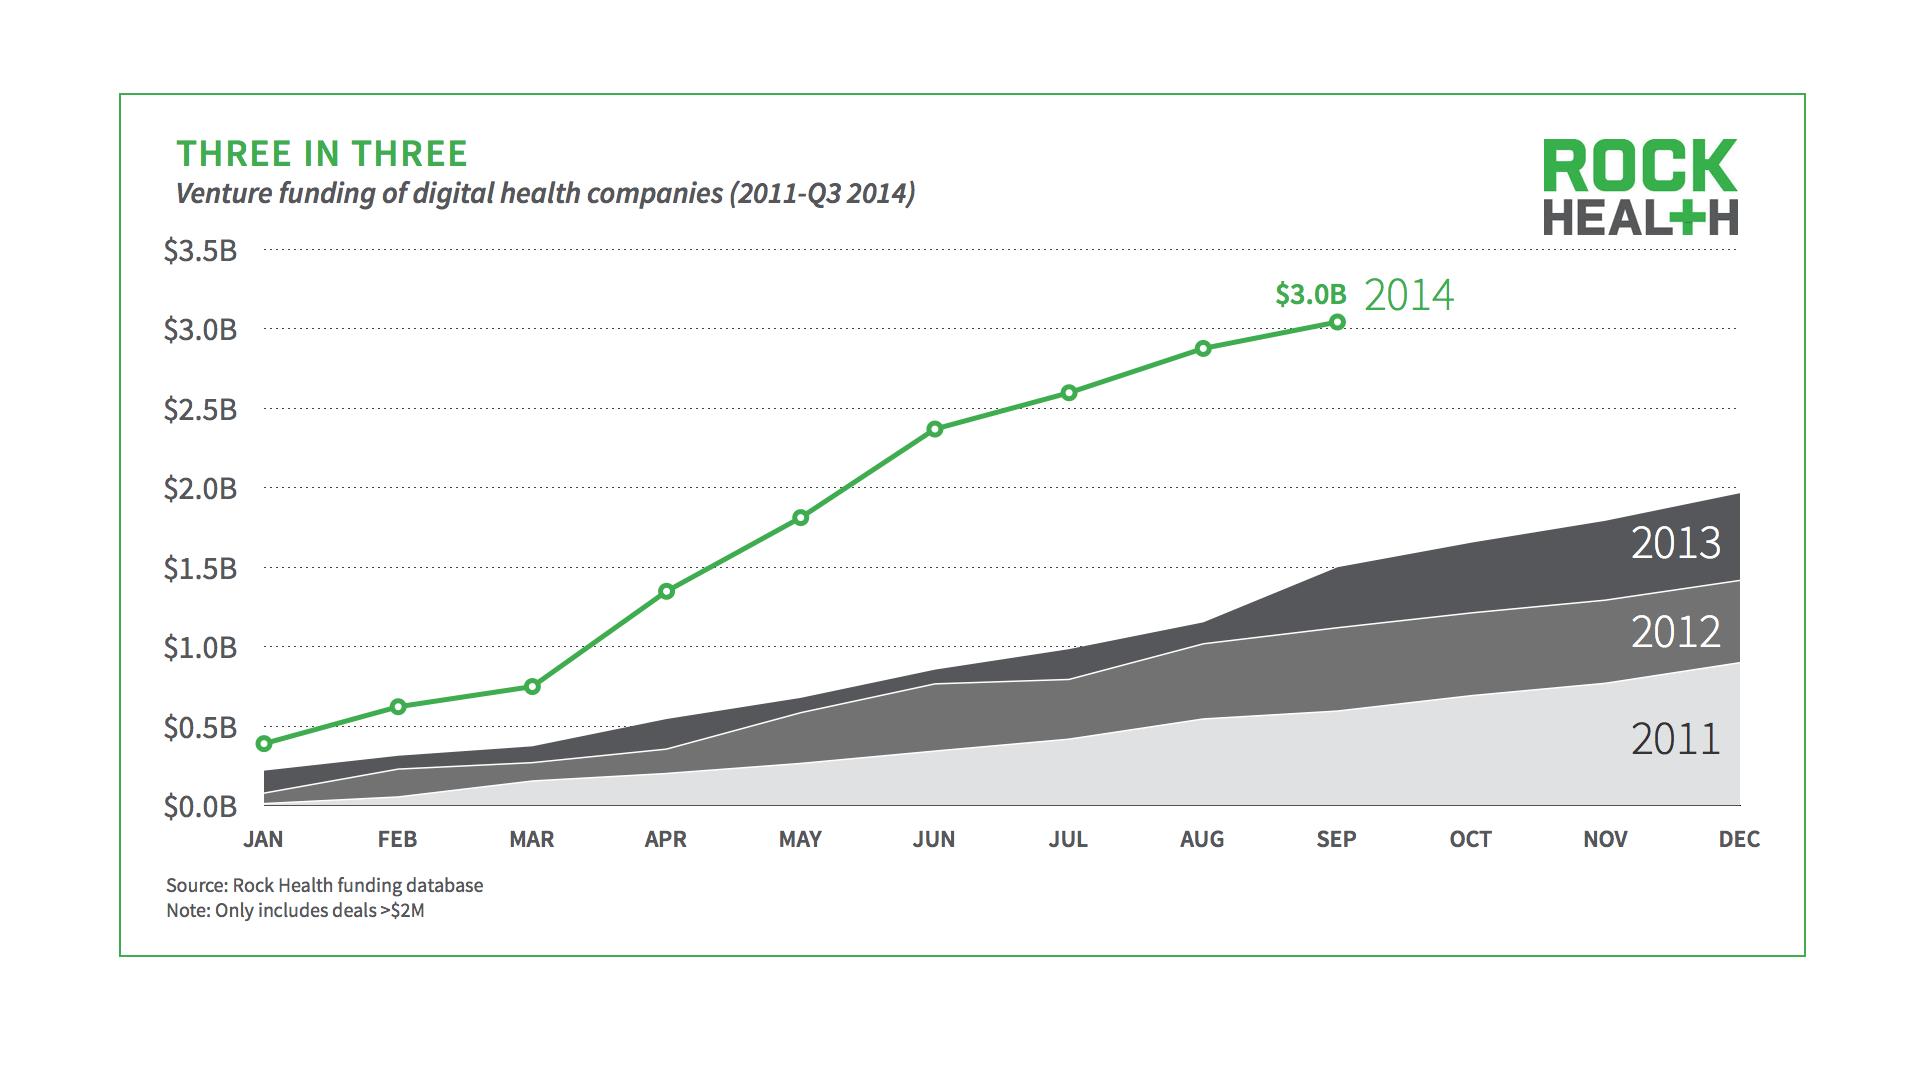 Digital health funding hits $3 billion